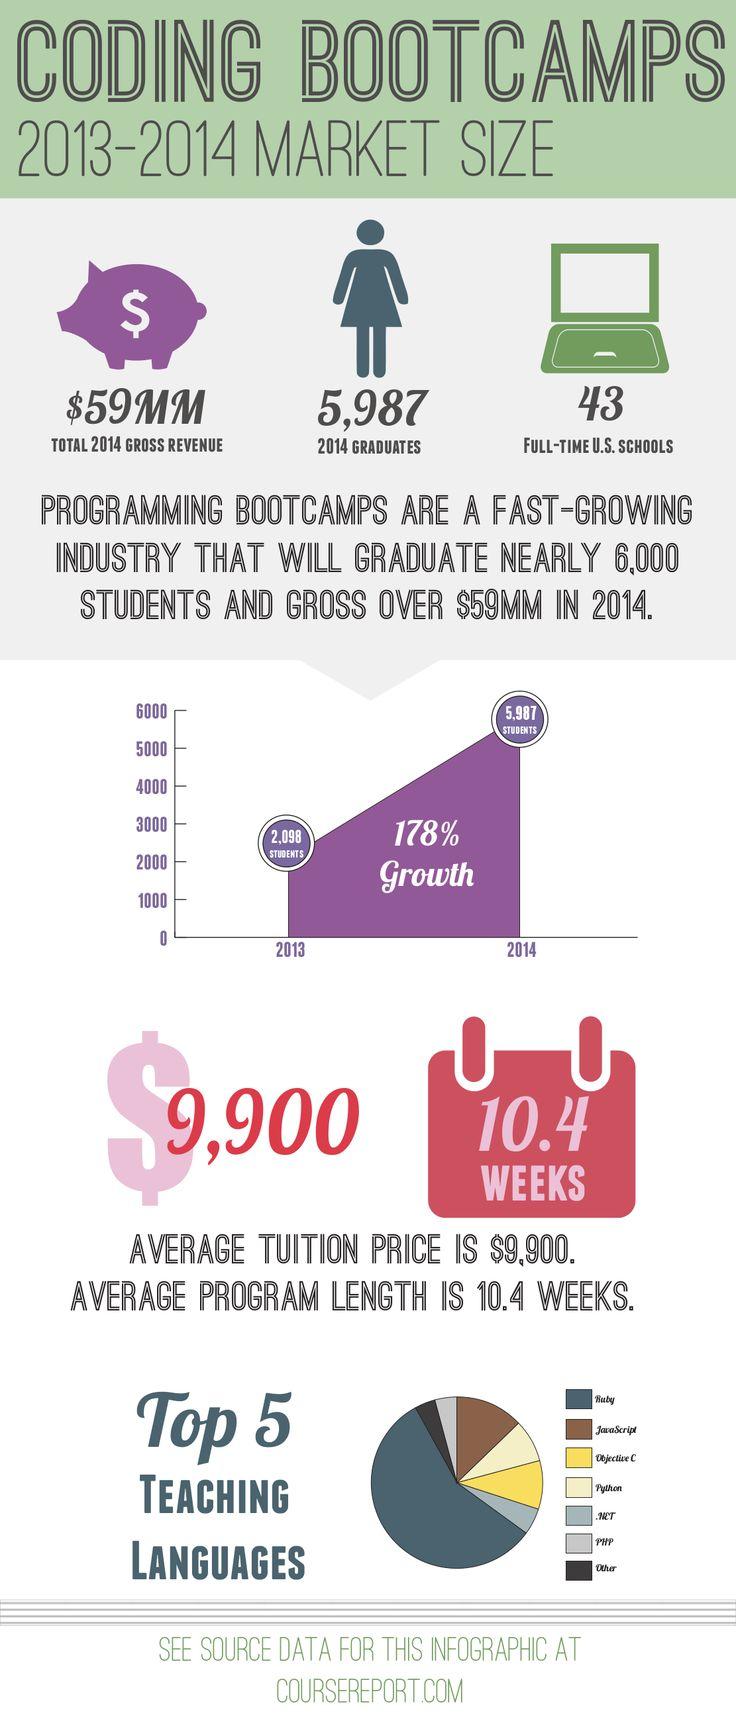 Programming Bootcamp Marketing Sizing Study Infographic